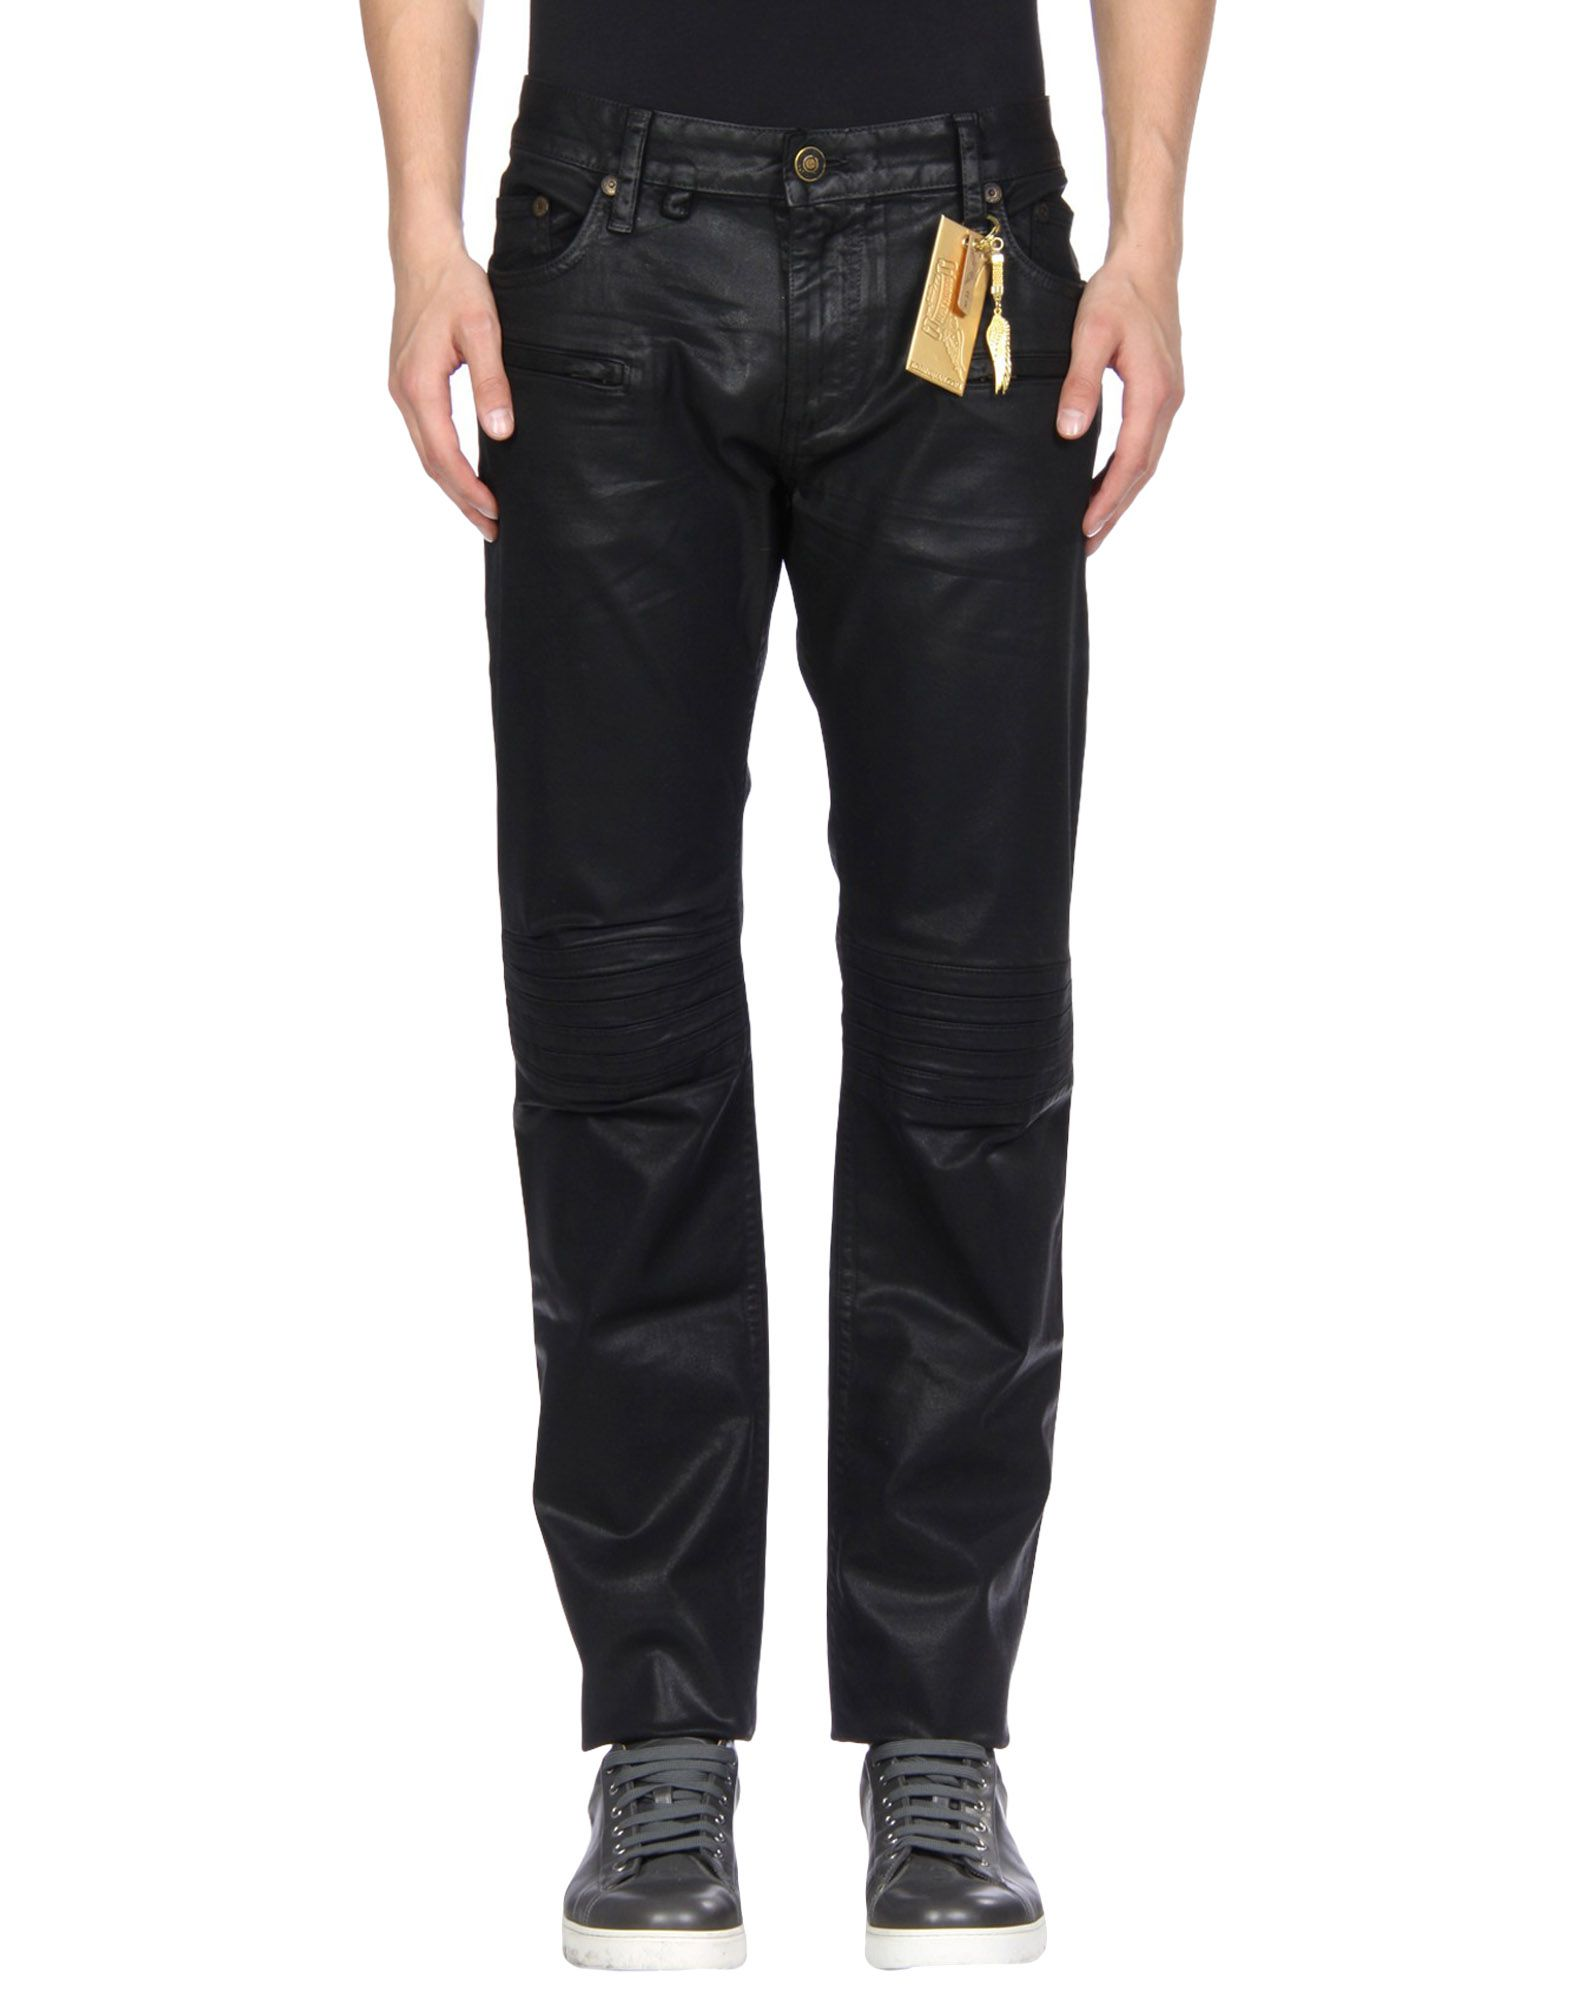 ROBIN'S JEAN Casual Pants in Black